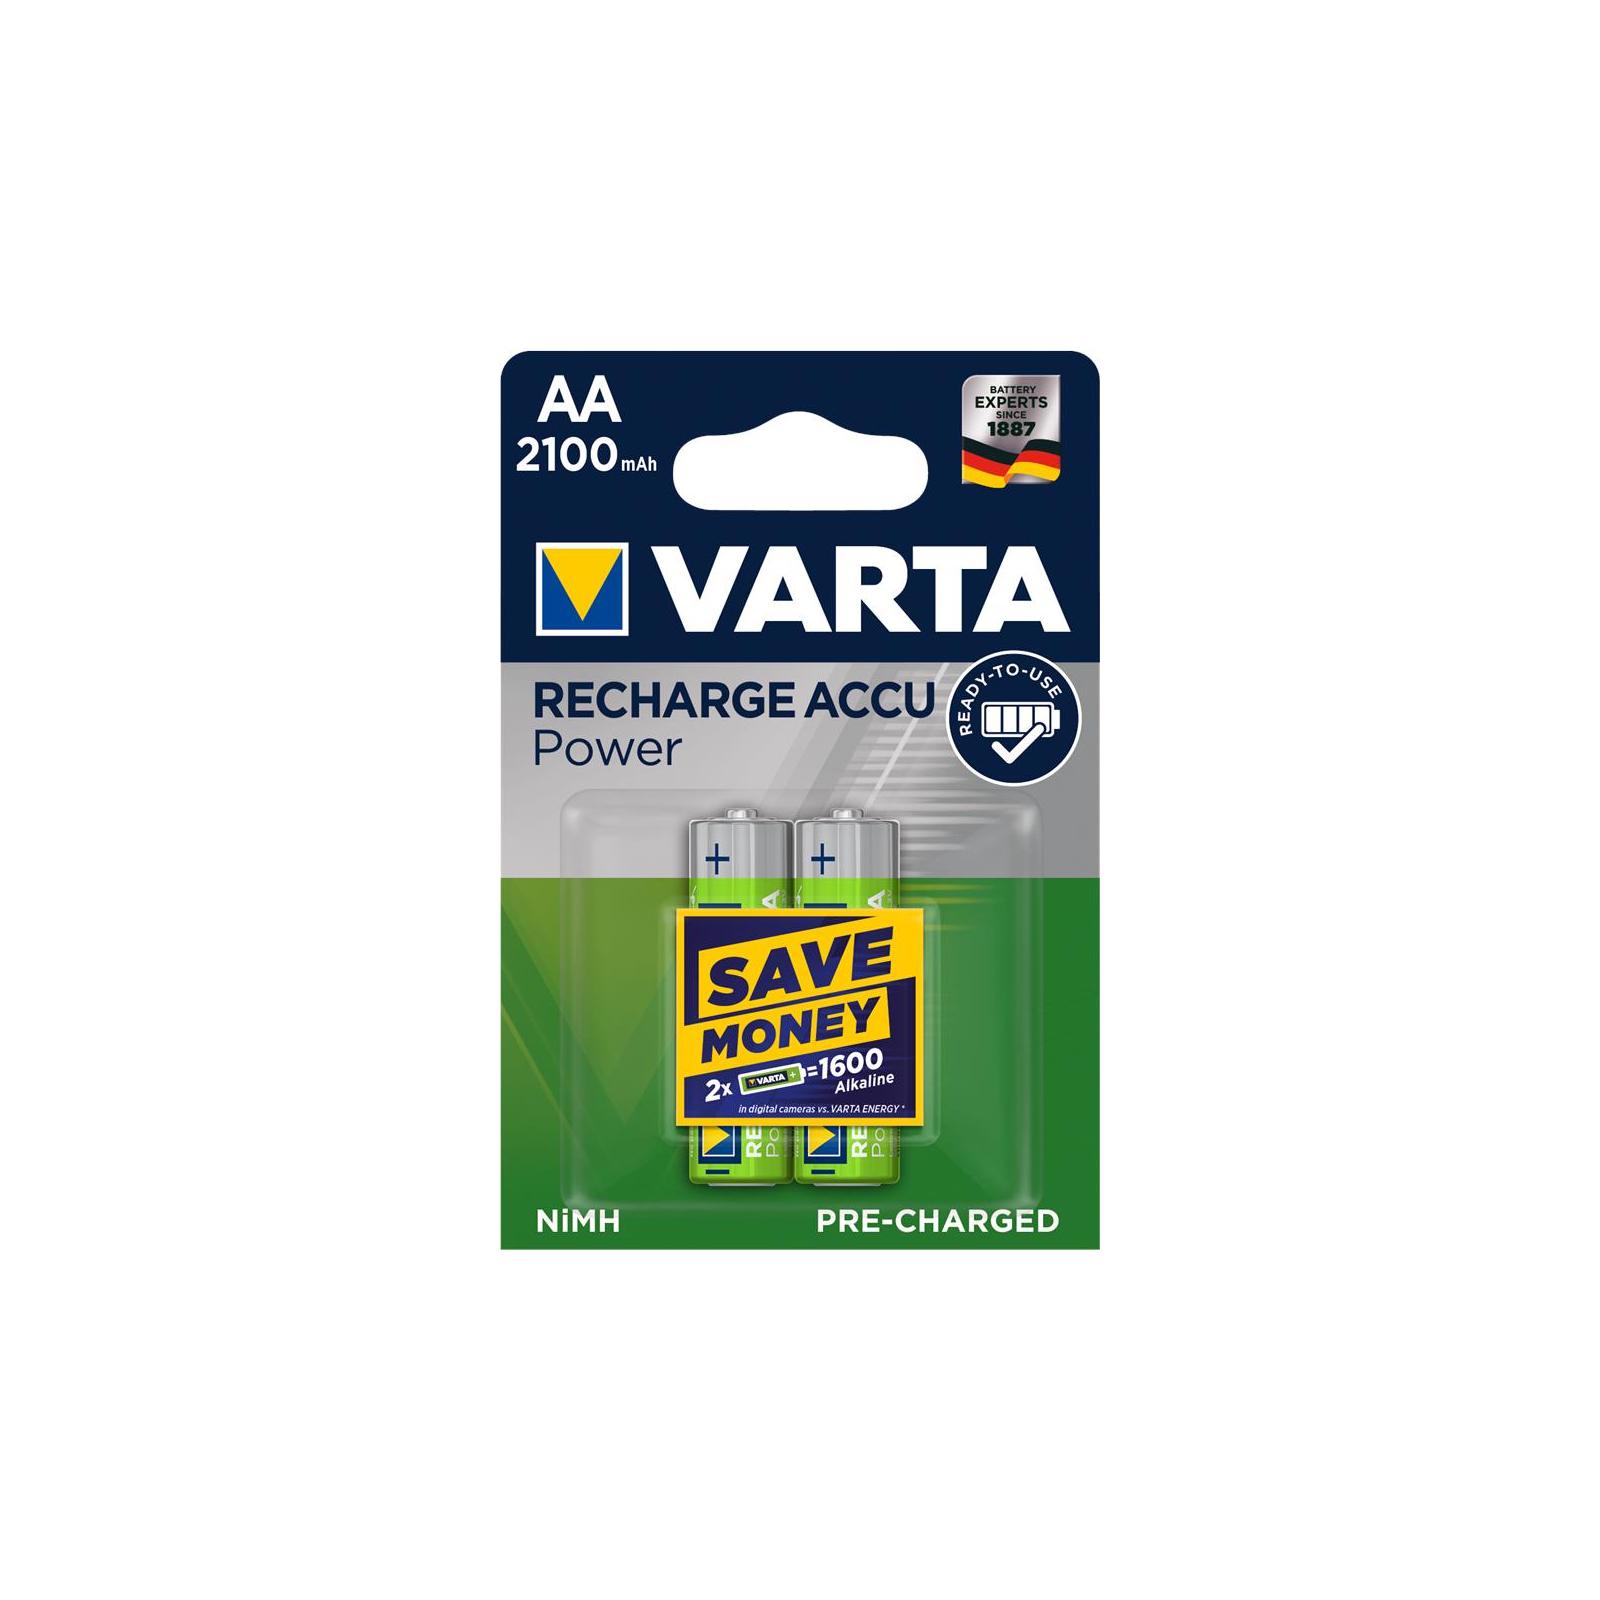 Аккумулятор Varta AA Rechargeable Accu 2100mAh * 2 (56706101402)